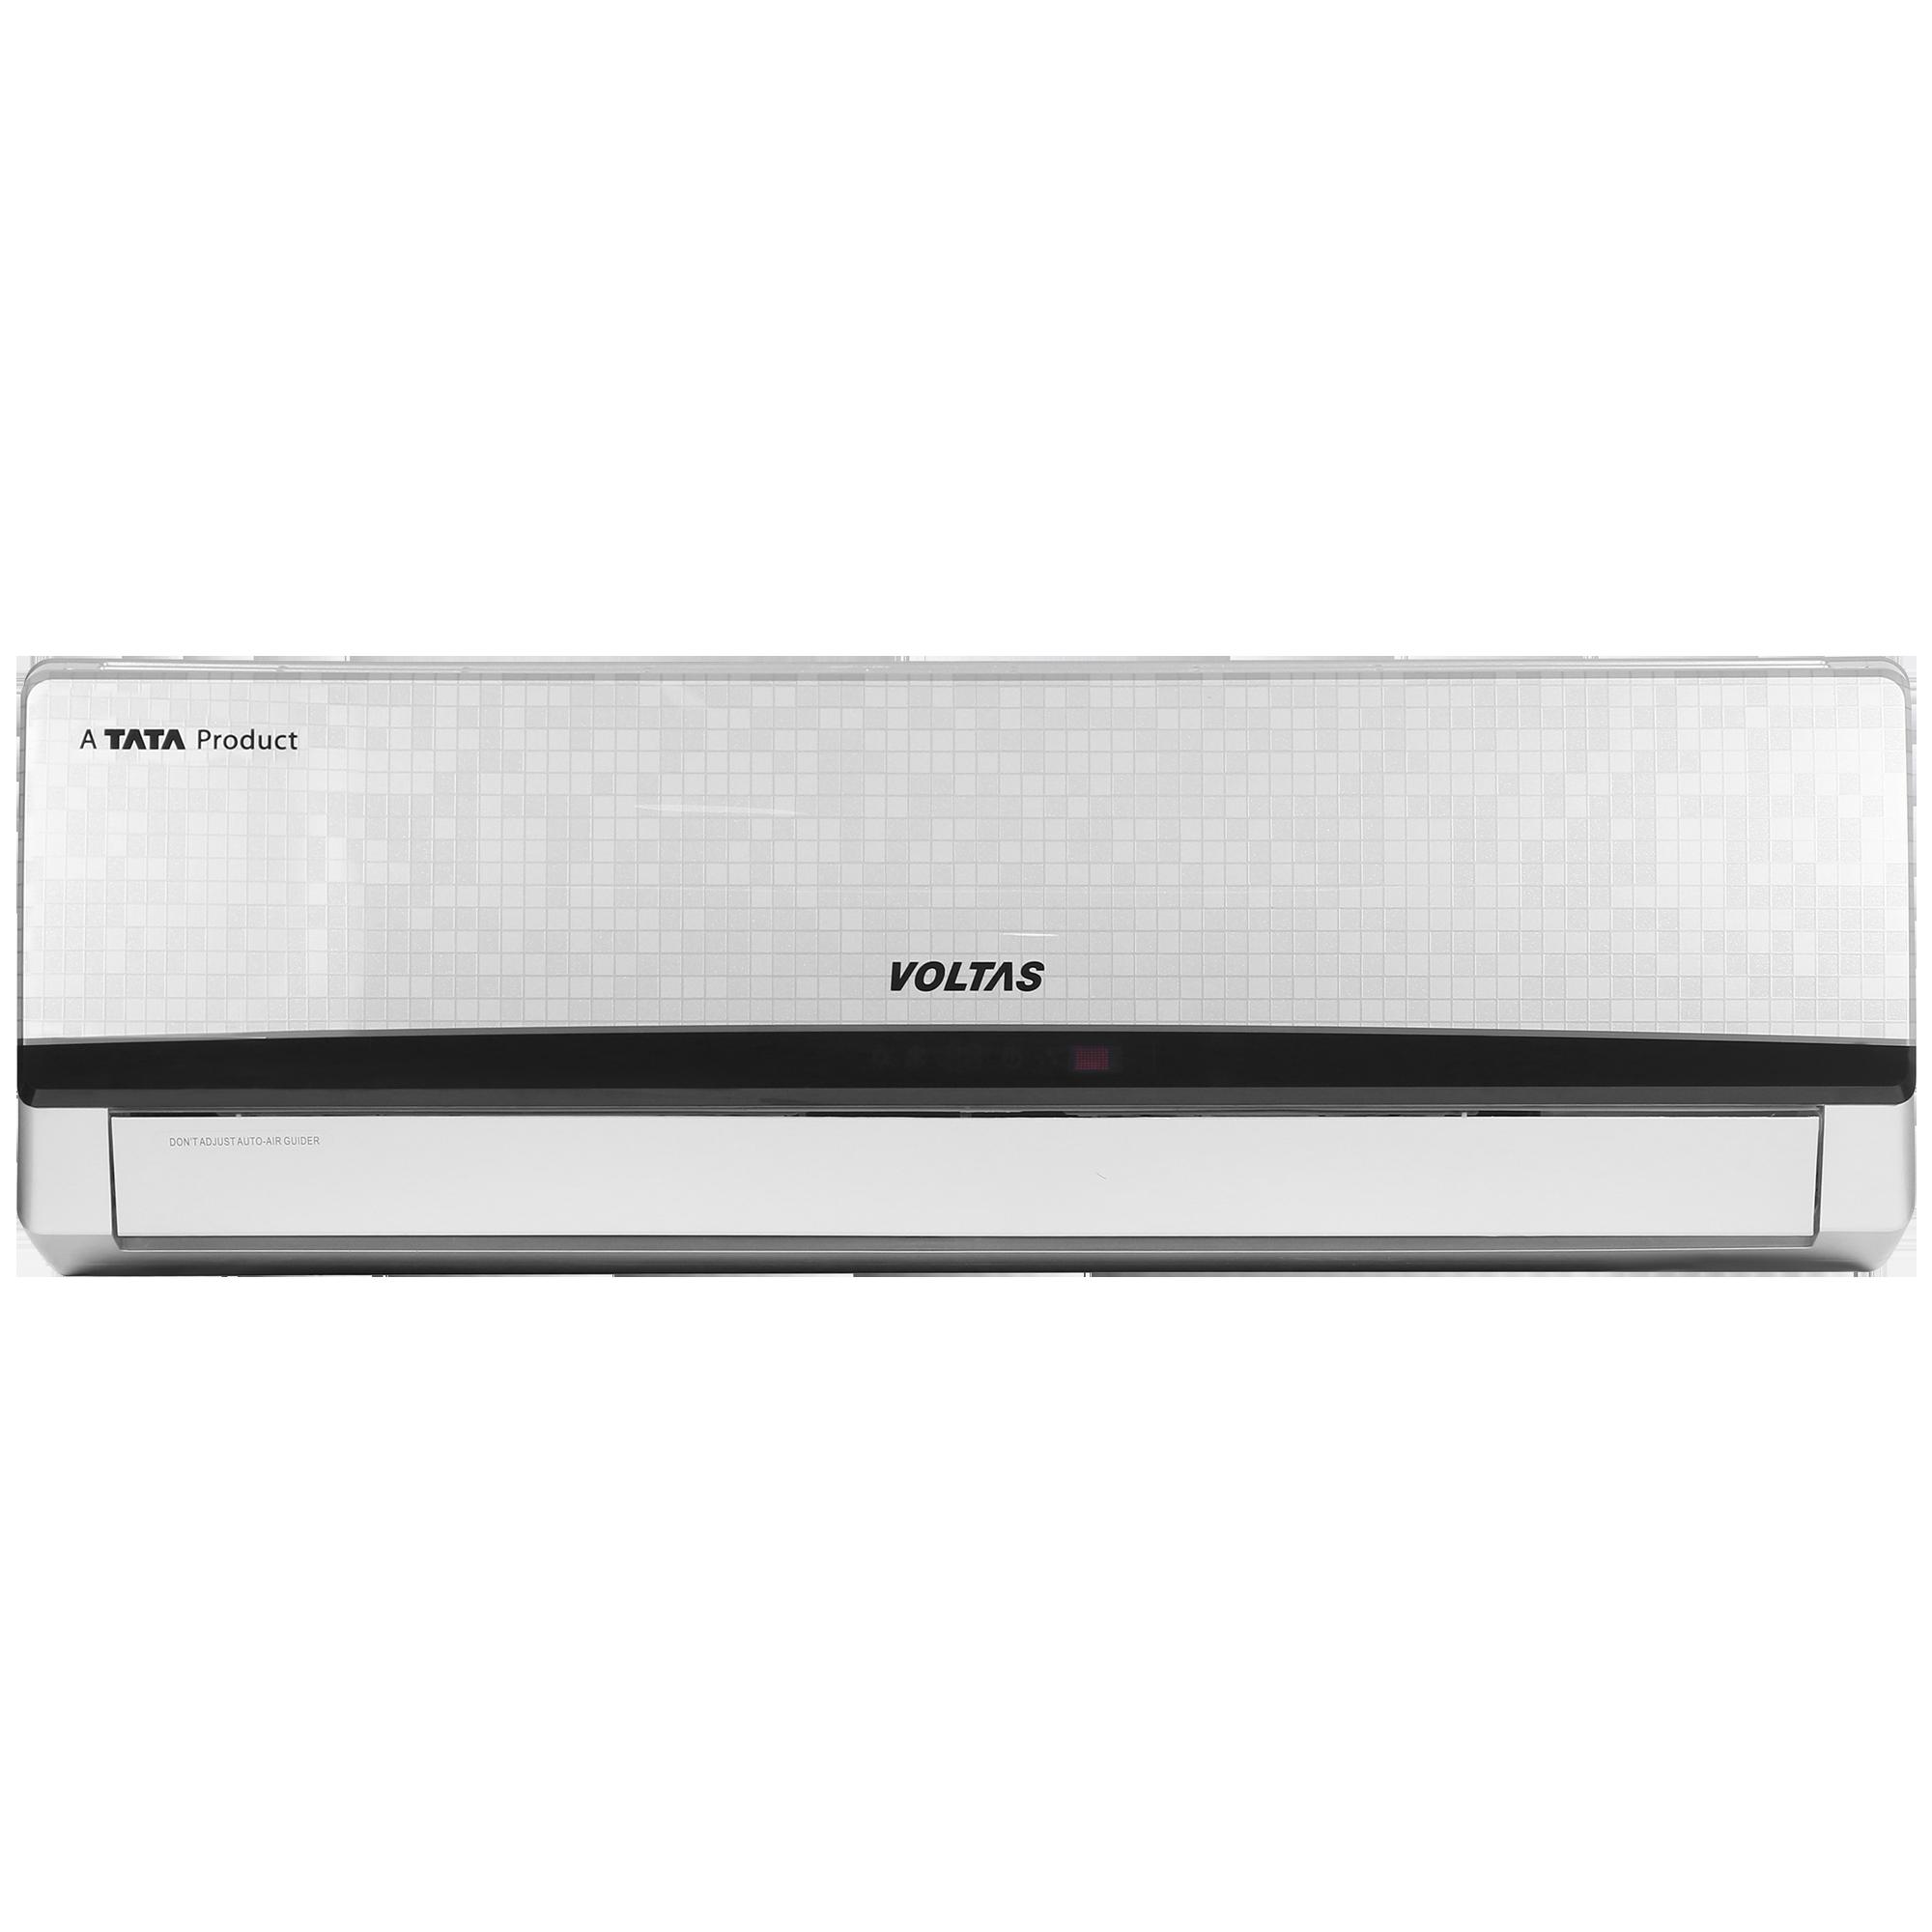 Voltas 1.5 Ton 5 Star Inverter Split AC (Adjustable AC, Copper Condenser, 185V MZY-IMS, Silver)_1